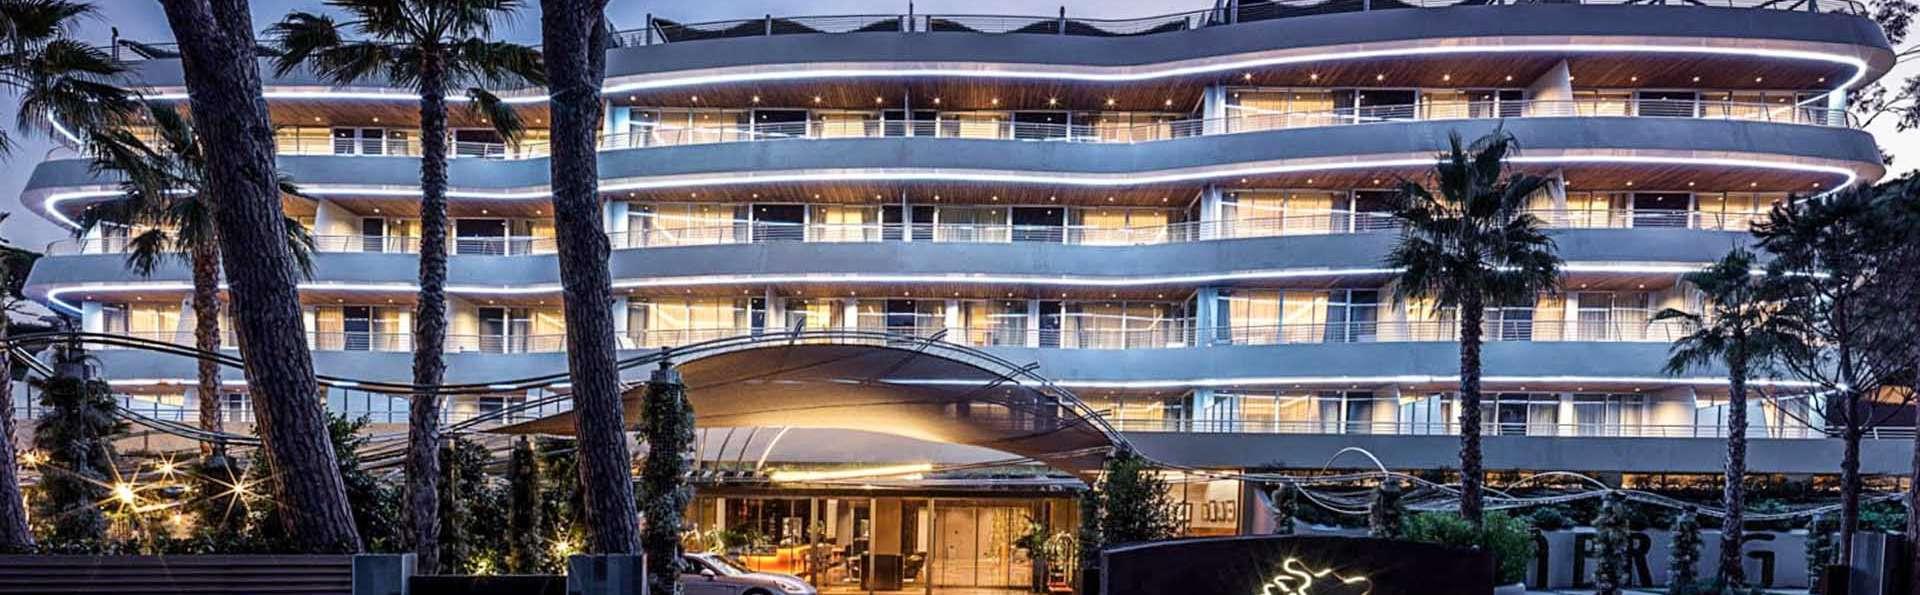 Alàbriga Hotel Spa & HomeSuites - EDIT_Hotel_01.jpg